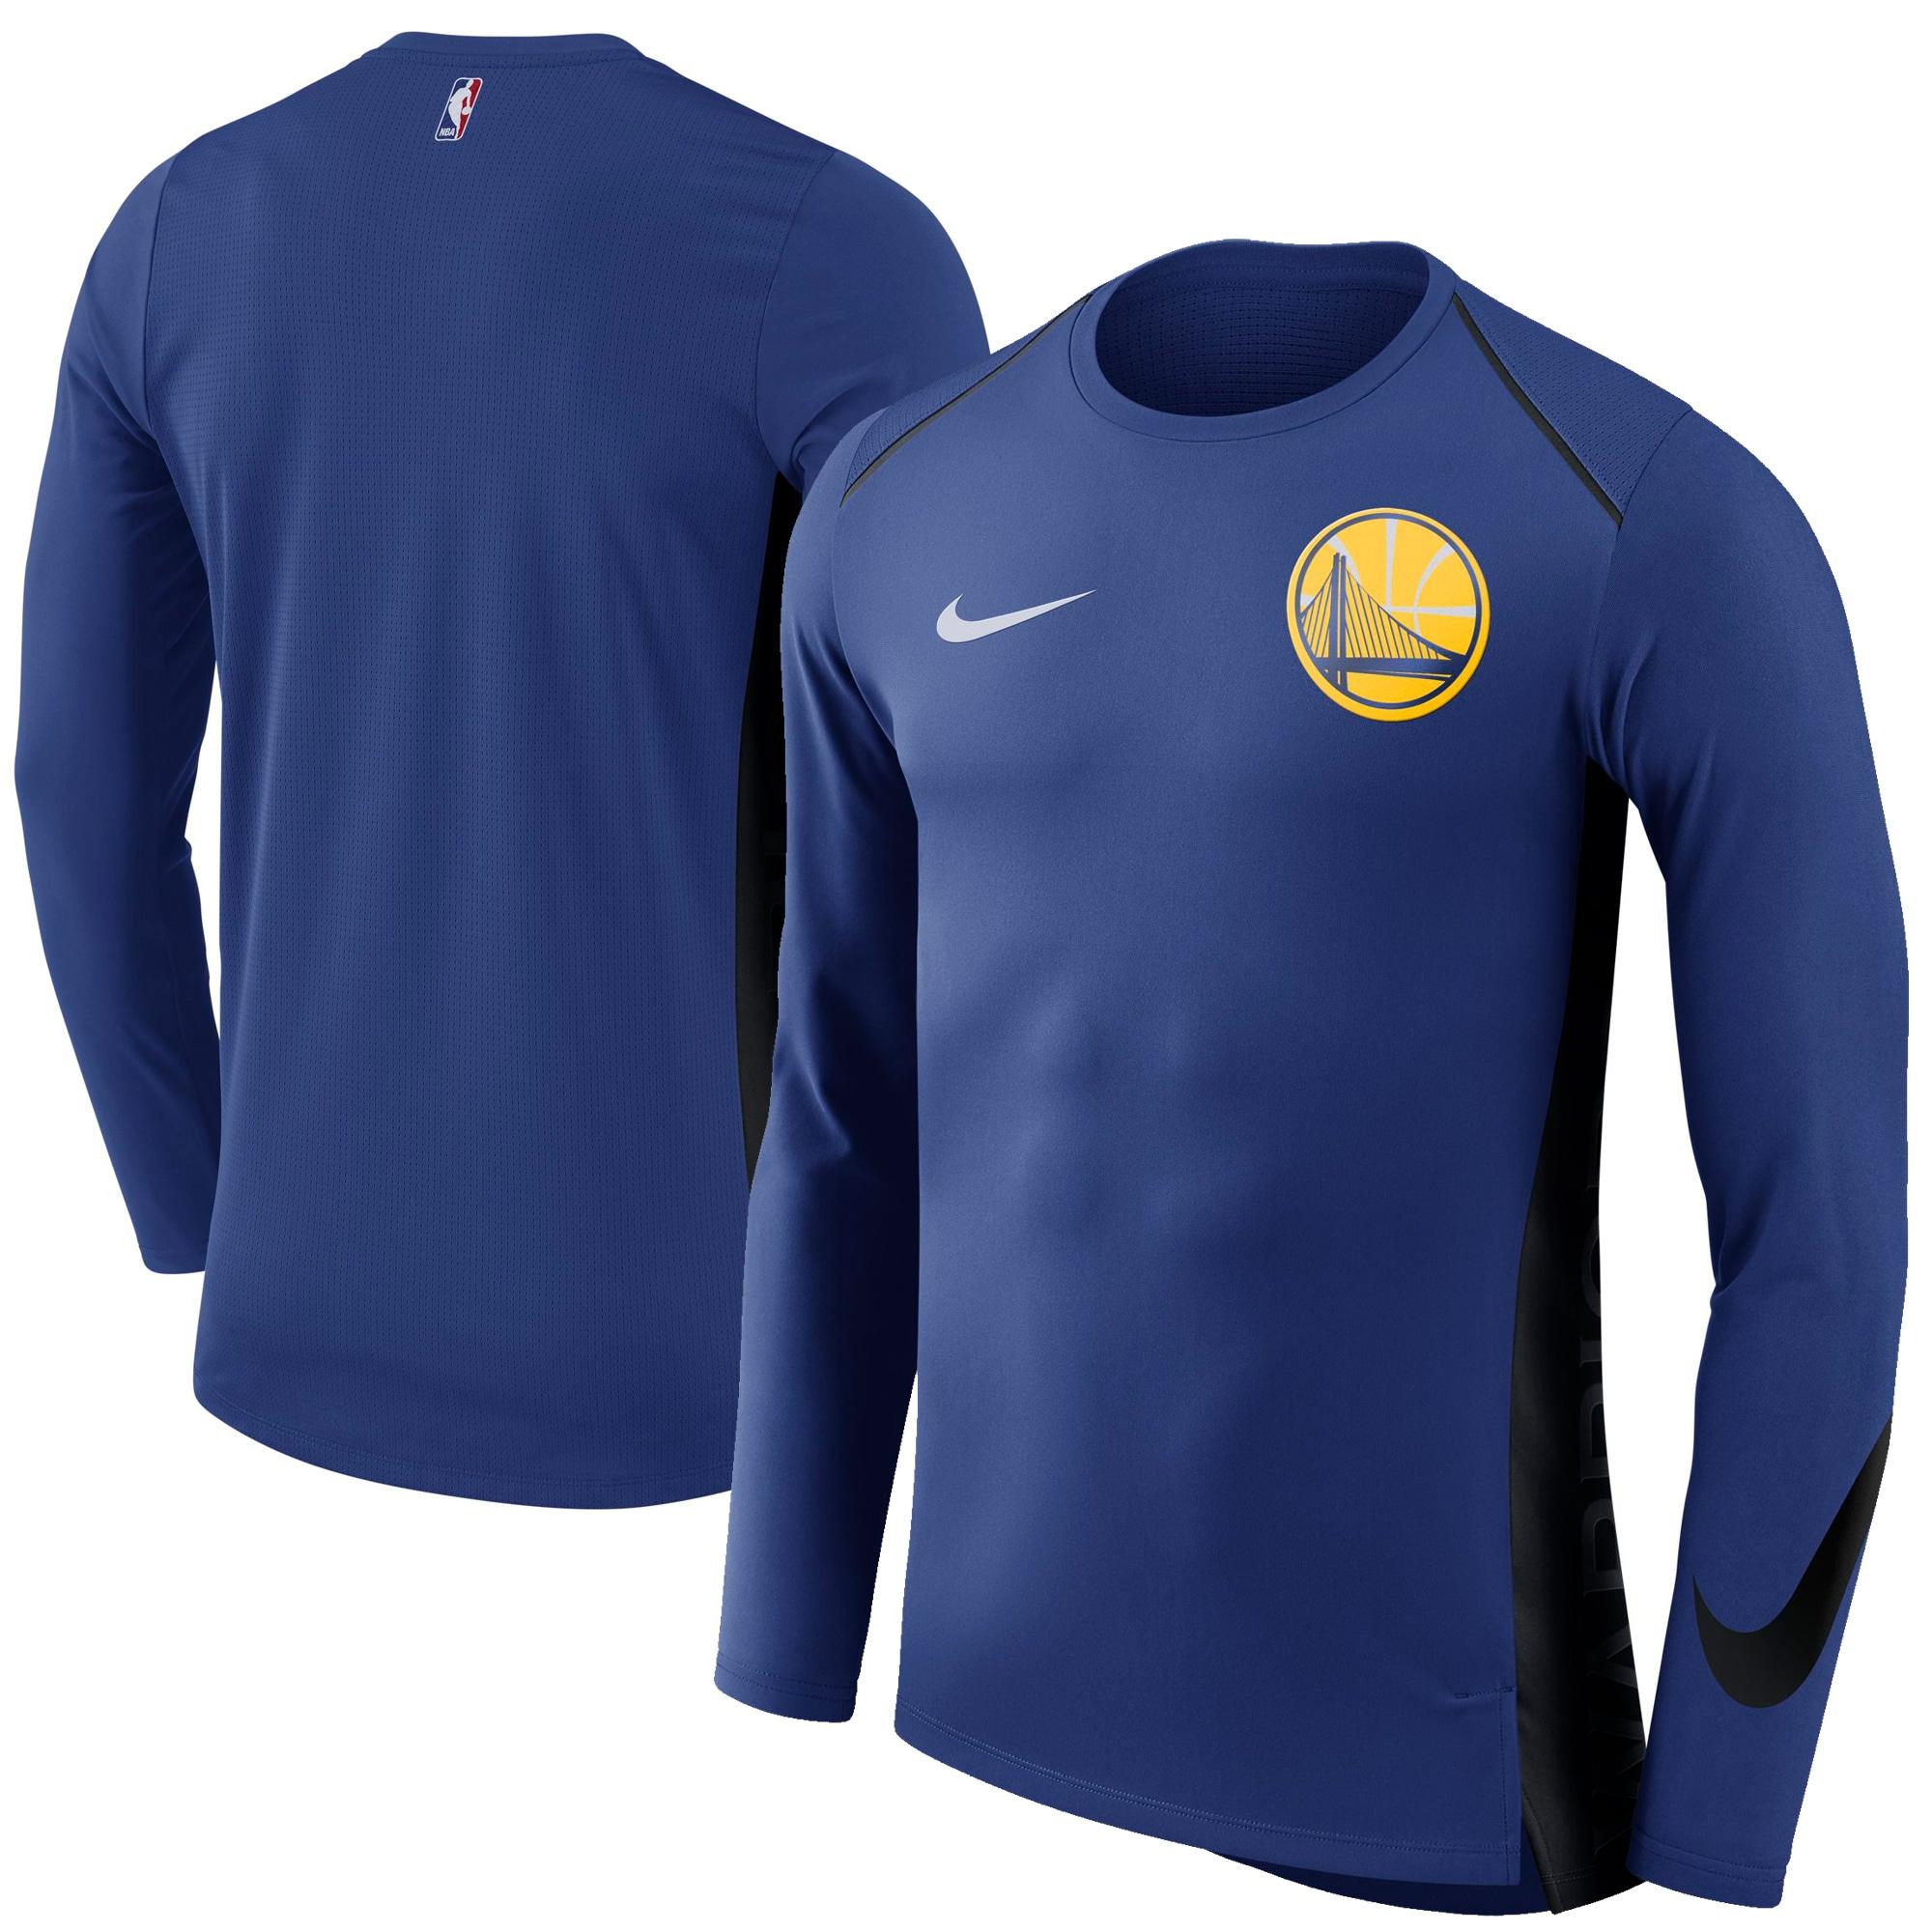 Golden State Warriors Nike Elite Shooter Performance Long Sleeve T-Shirt - Blue